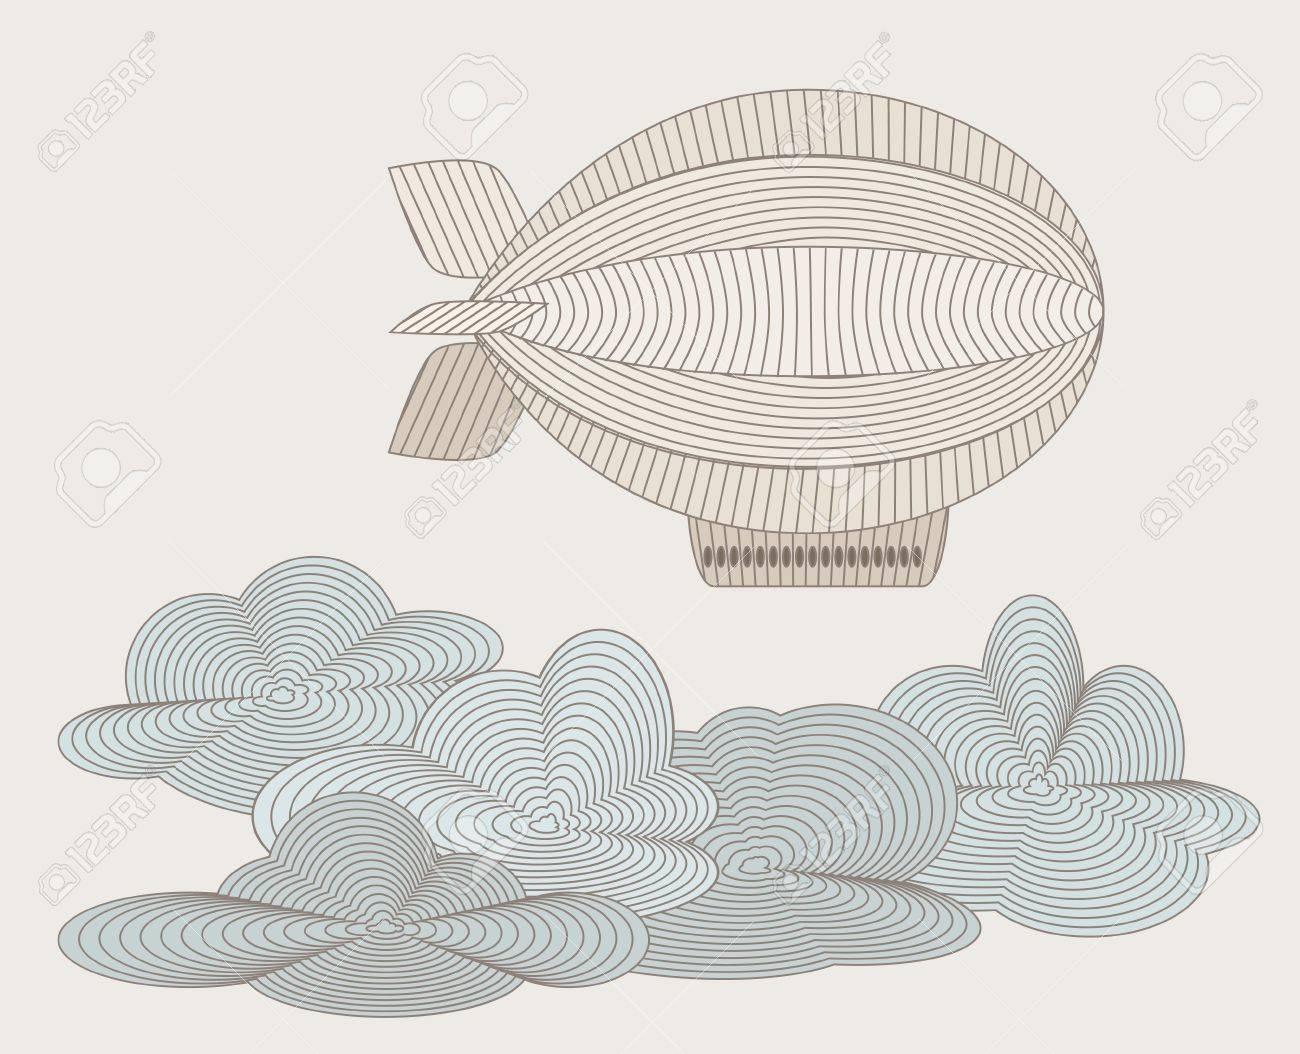 Retro zeppelin drawn with plenty lines Stock Vector - 16433457